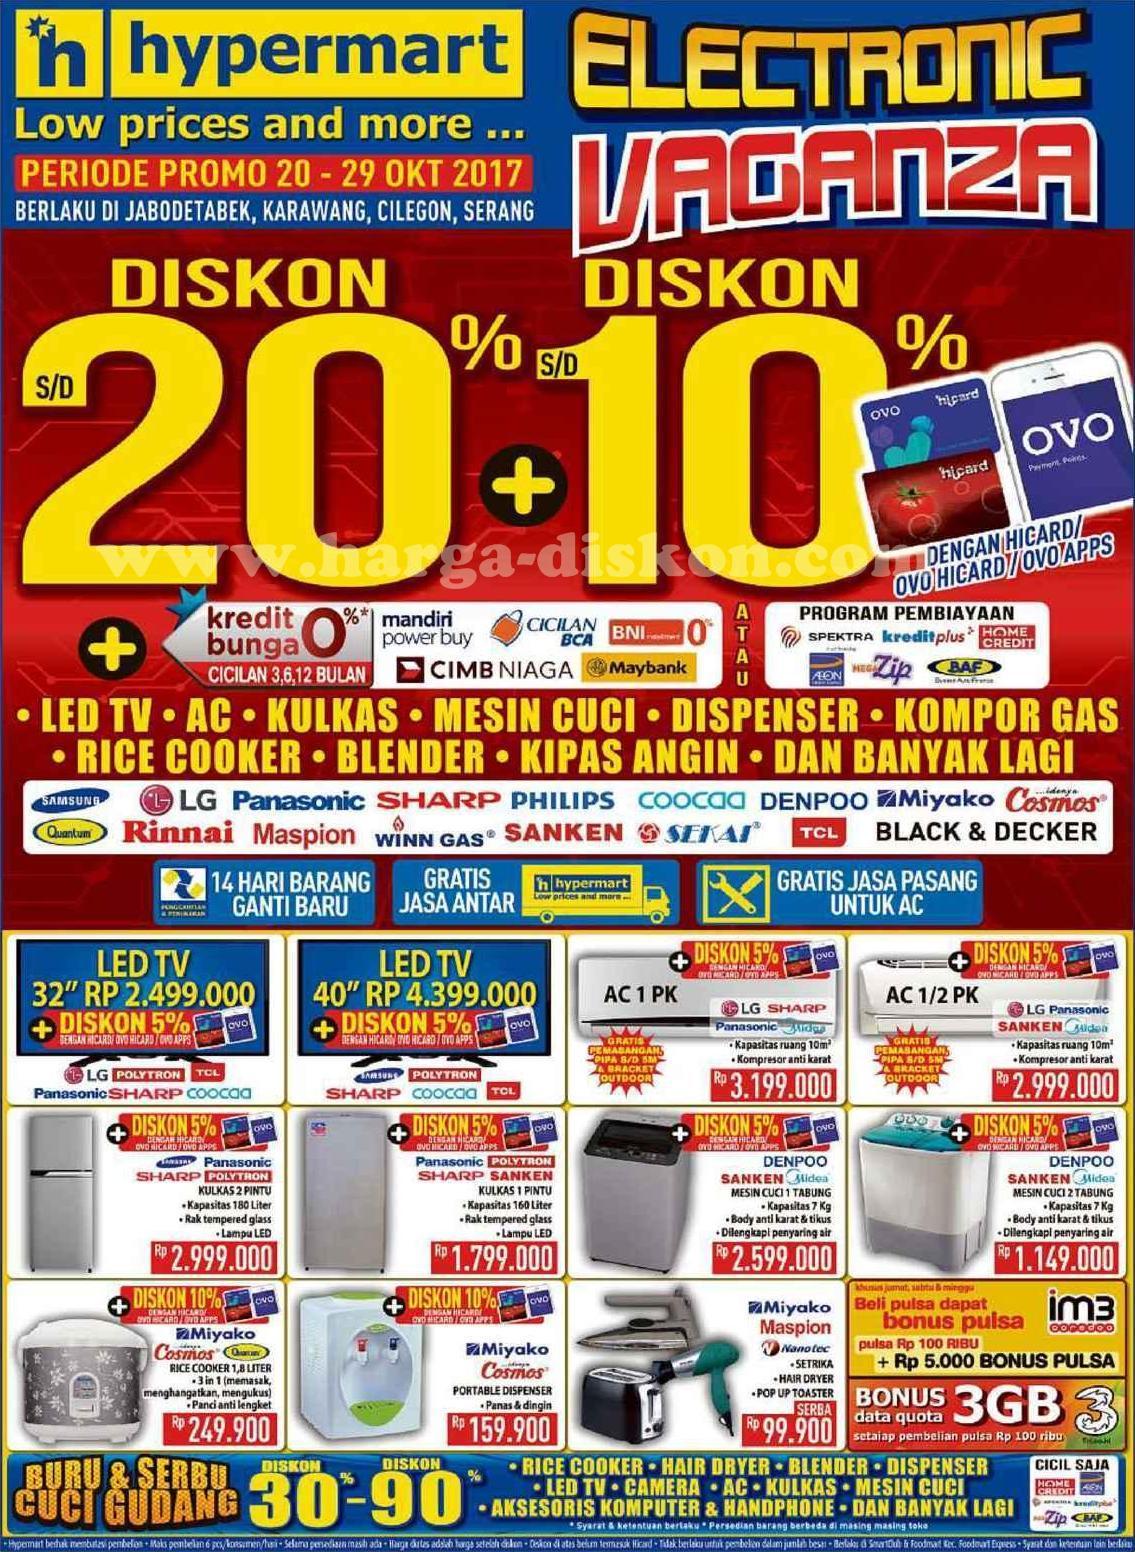 Promo Hypermart Terbaru Electronic Vaganza Periode 20 29 Oktober 2017 Harga Diskon